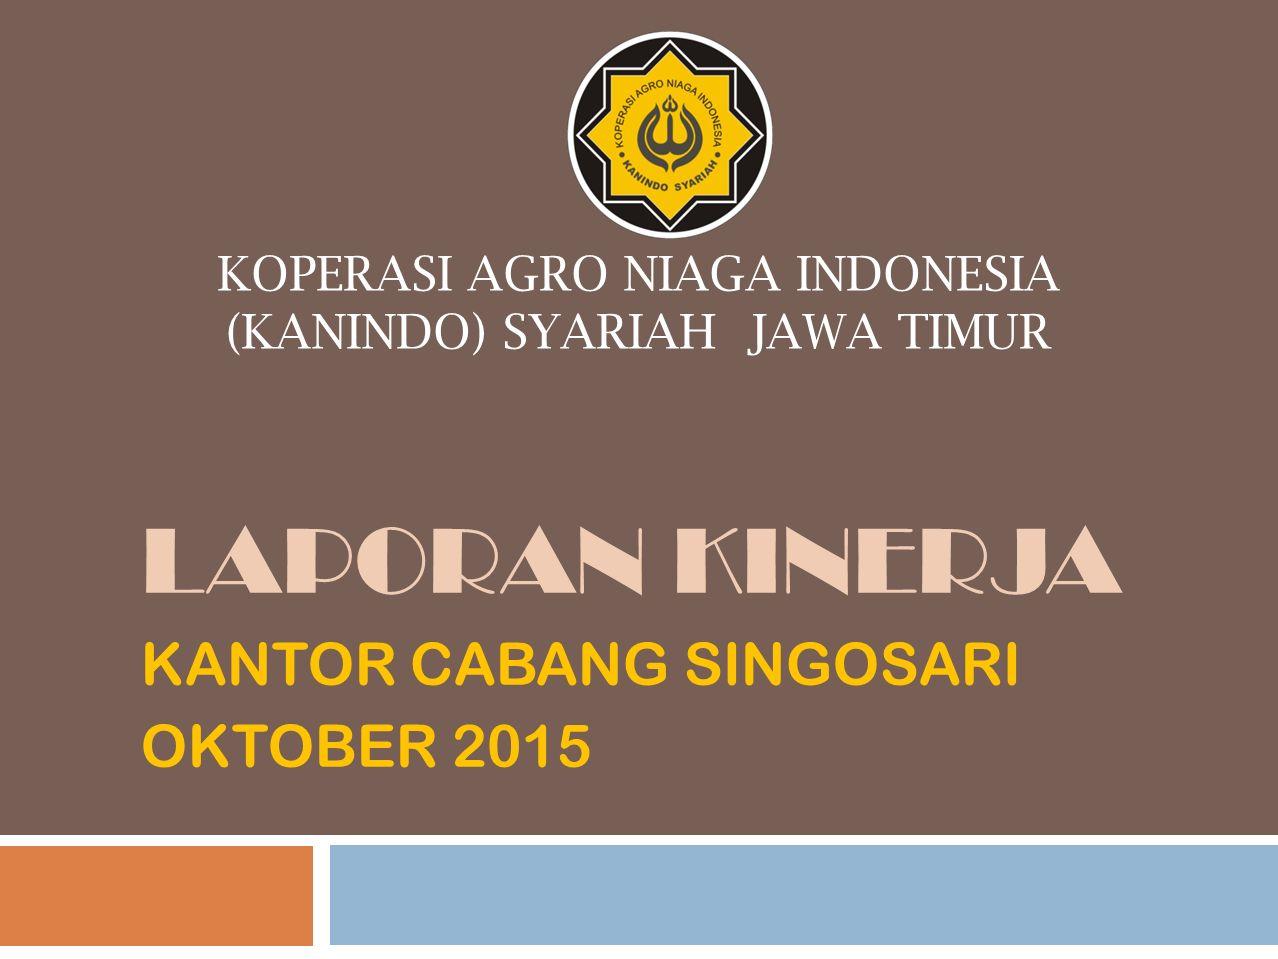 KOPERASI AGRO NIAGA INDONESIA (KANINDO) SYARIAH JAWA TIMUR LAPORAN KINERJA KANTOR CABANG SINGOSARI OKTOBER 2015